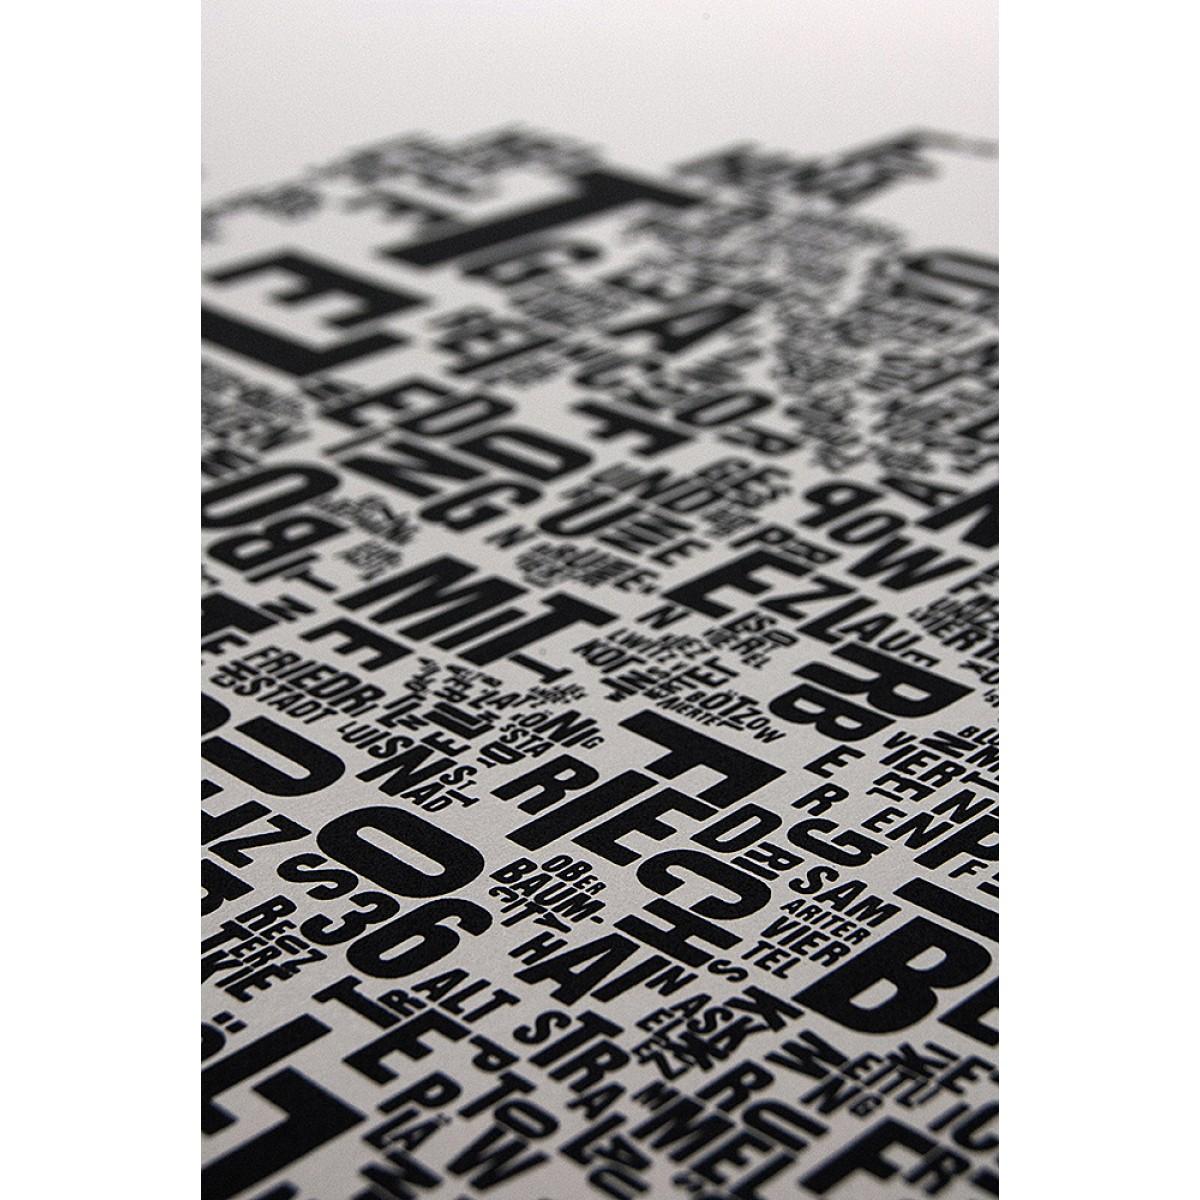 Buchstabenort Berlin Stadtteile-Poster Typografie